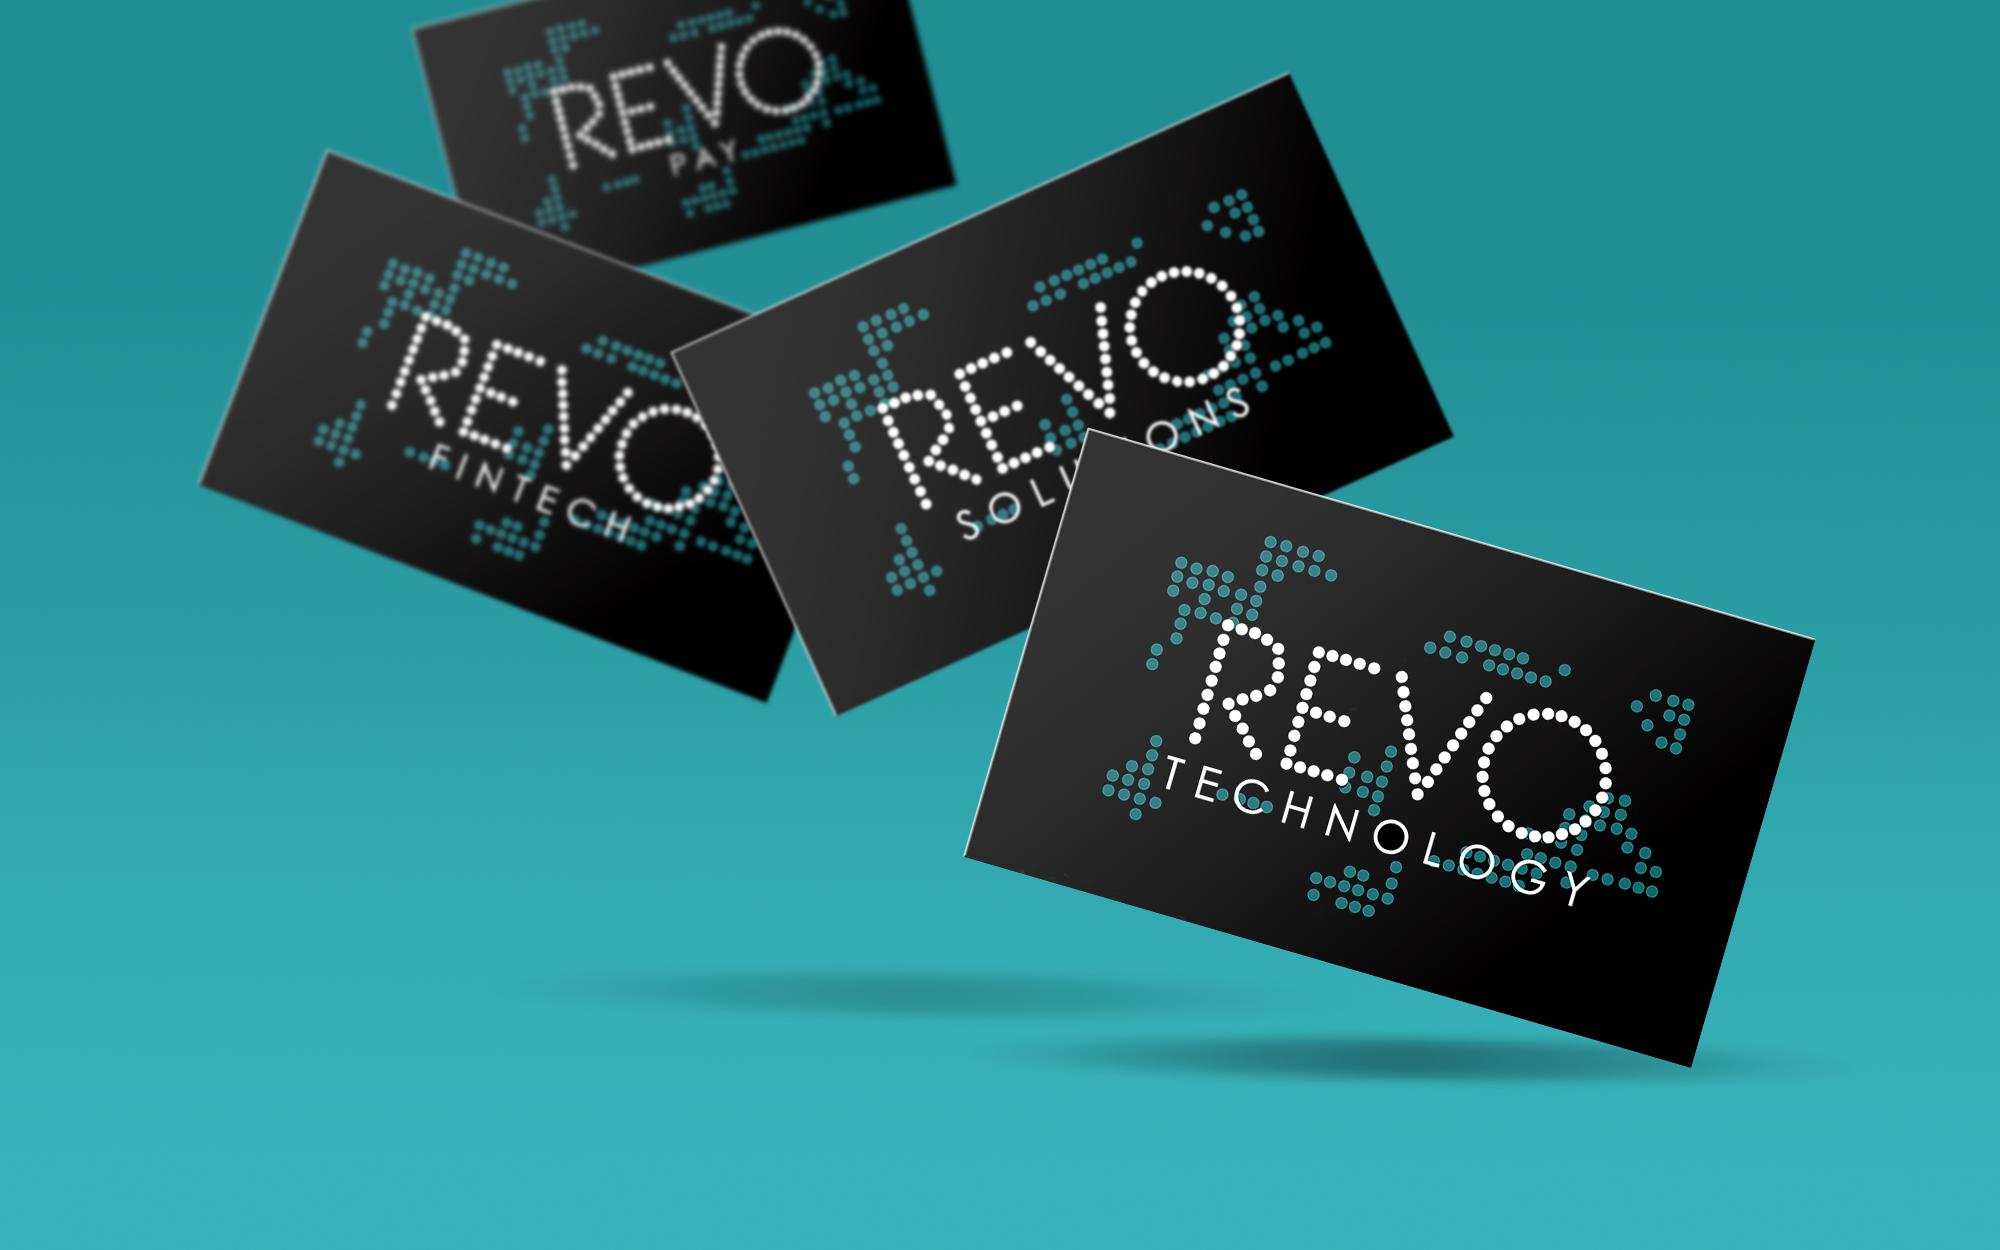 RevoTech